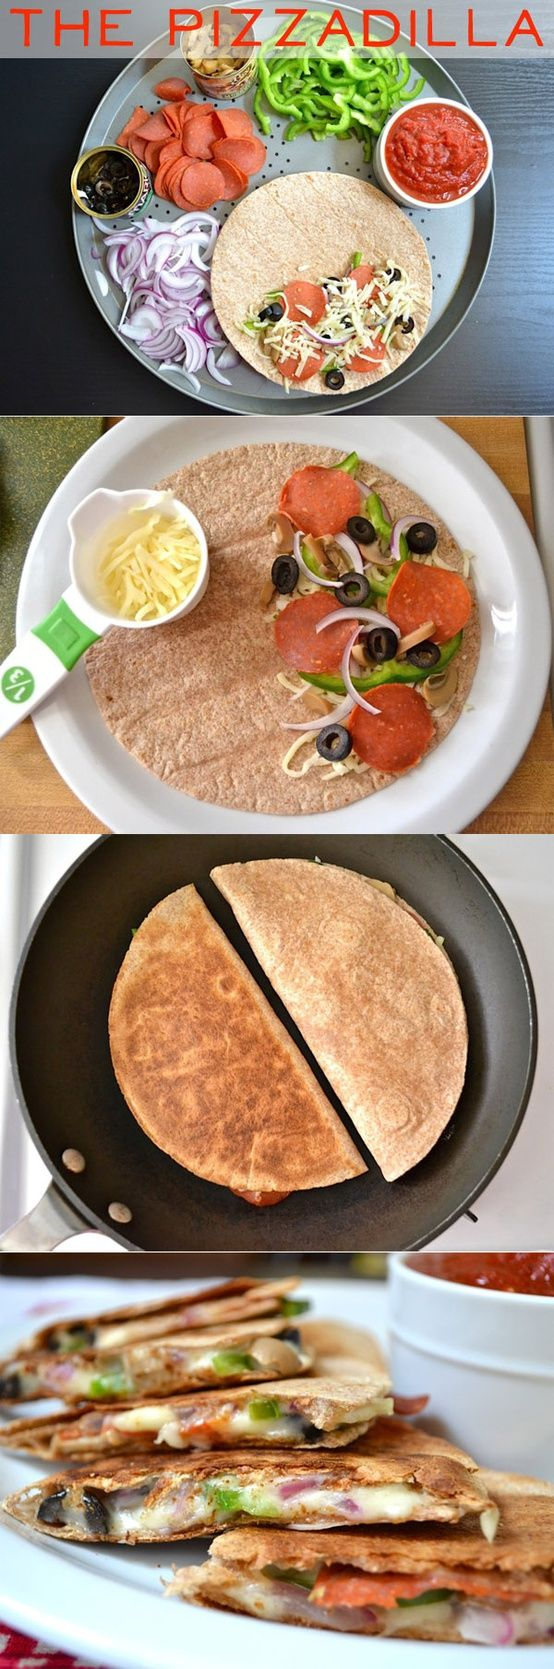 Lunch Idea! Pizzadillas - healthier pizza option